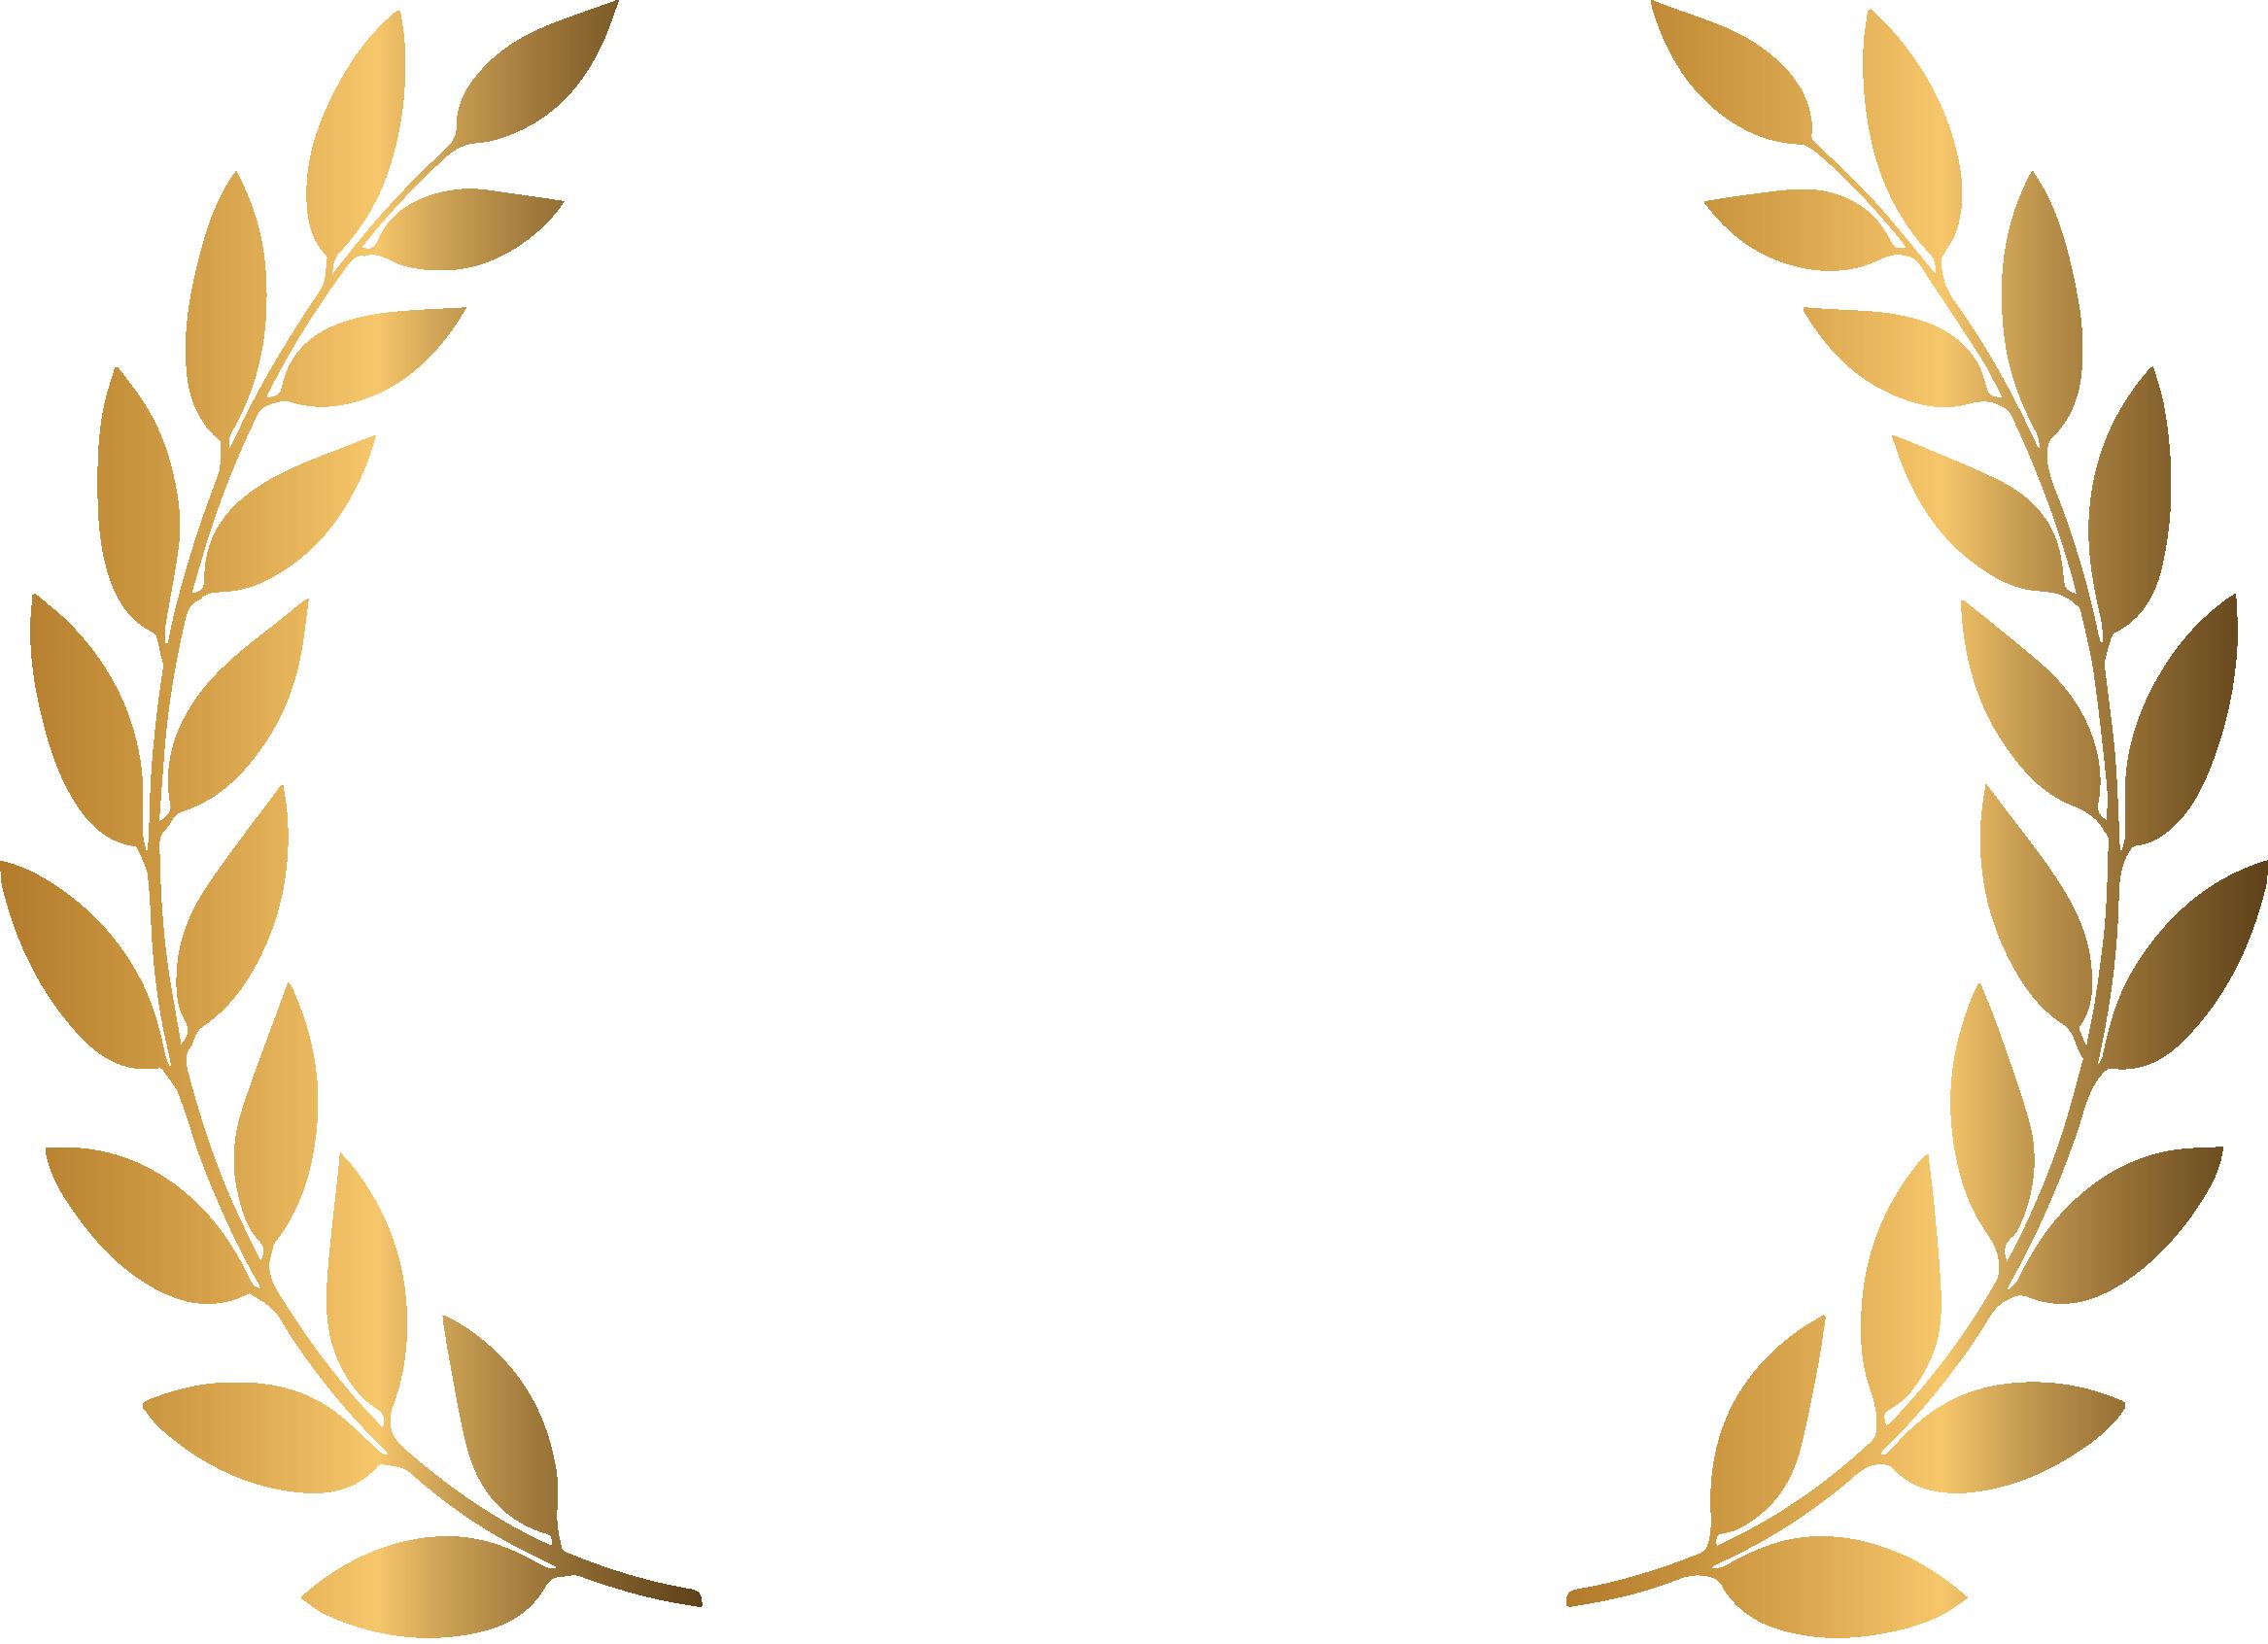 Board of Directors TORI Award 1